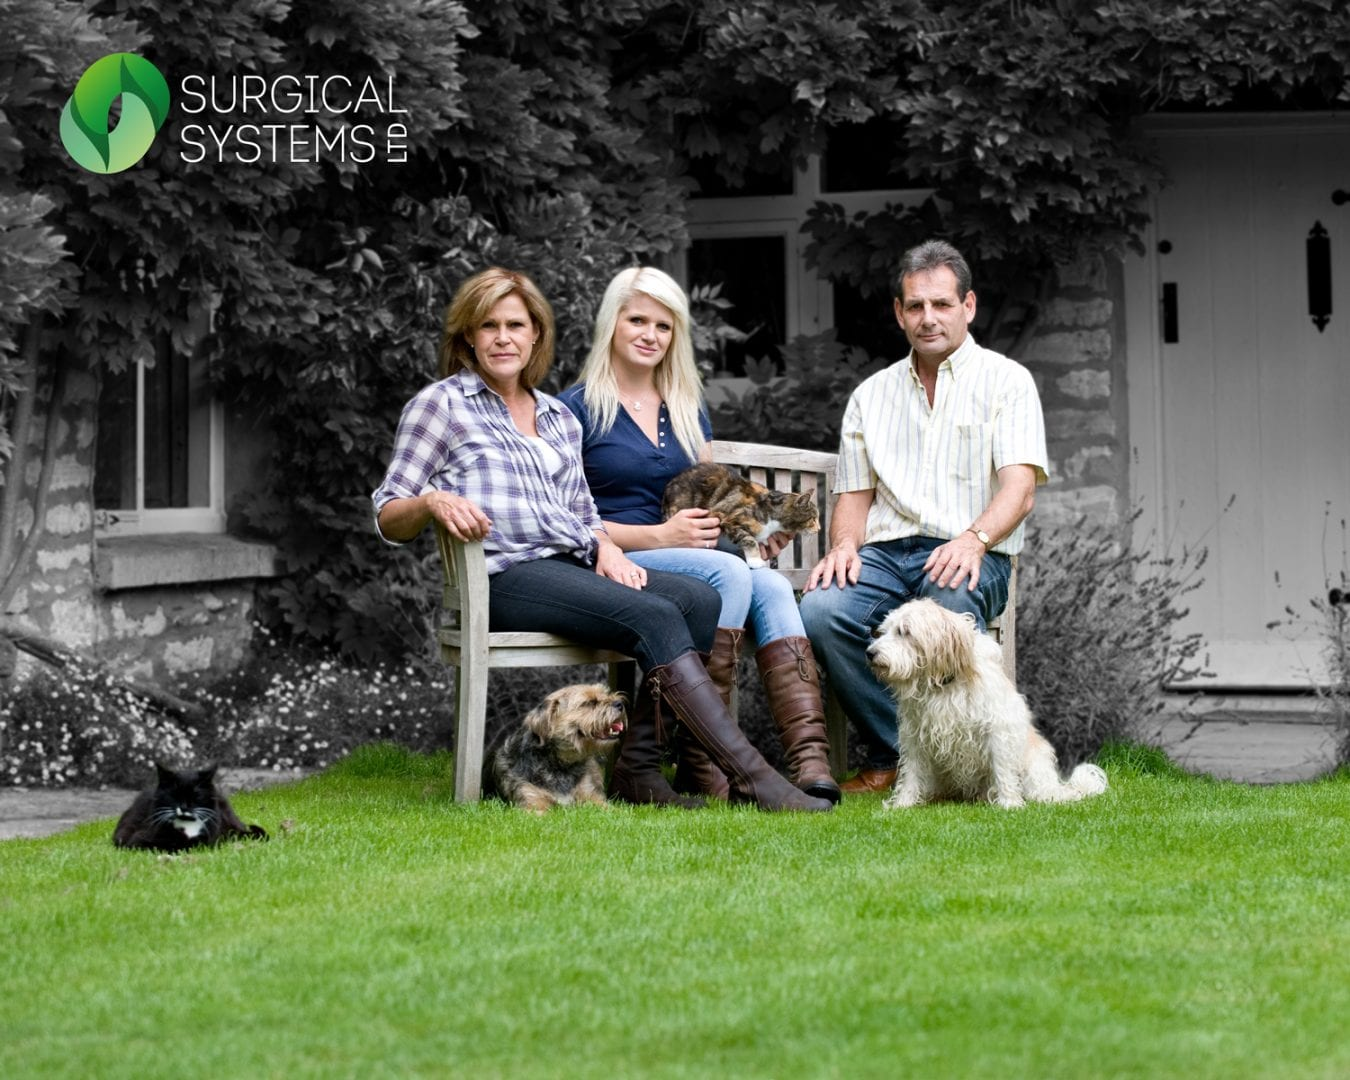 Harvey Family Surgical Systems Ltd